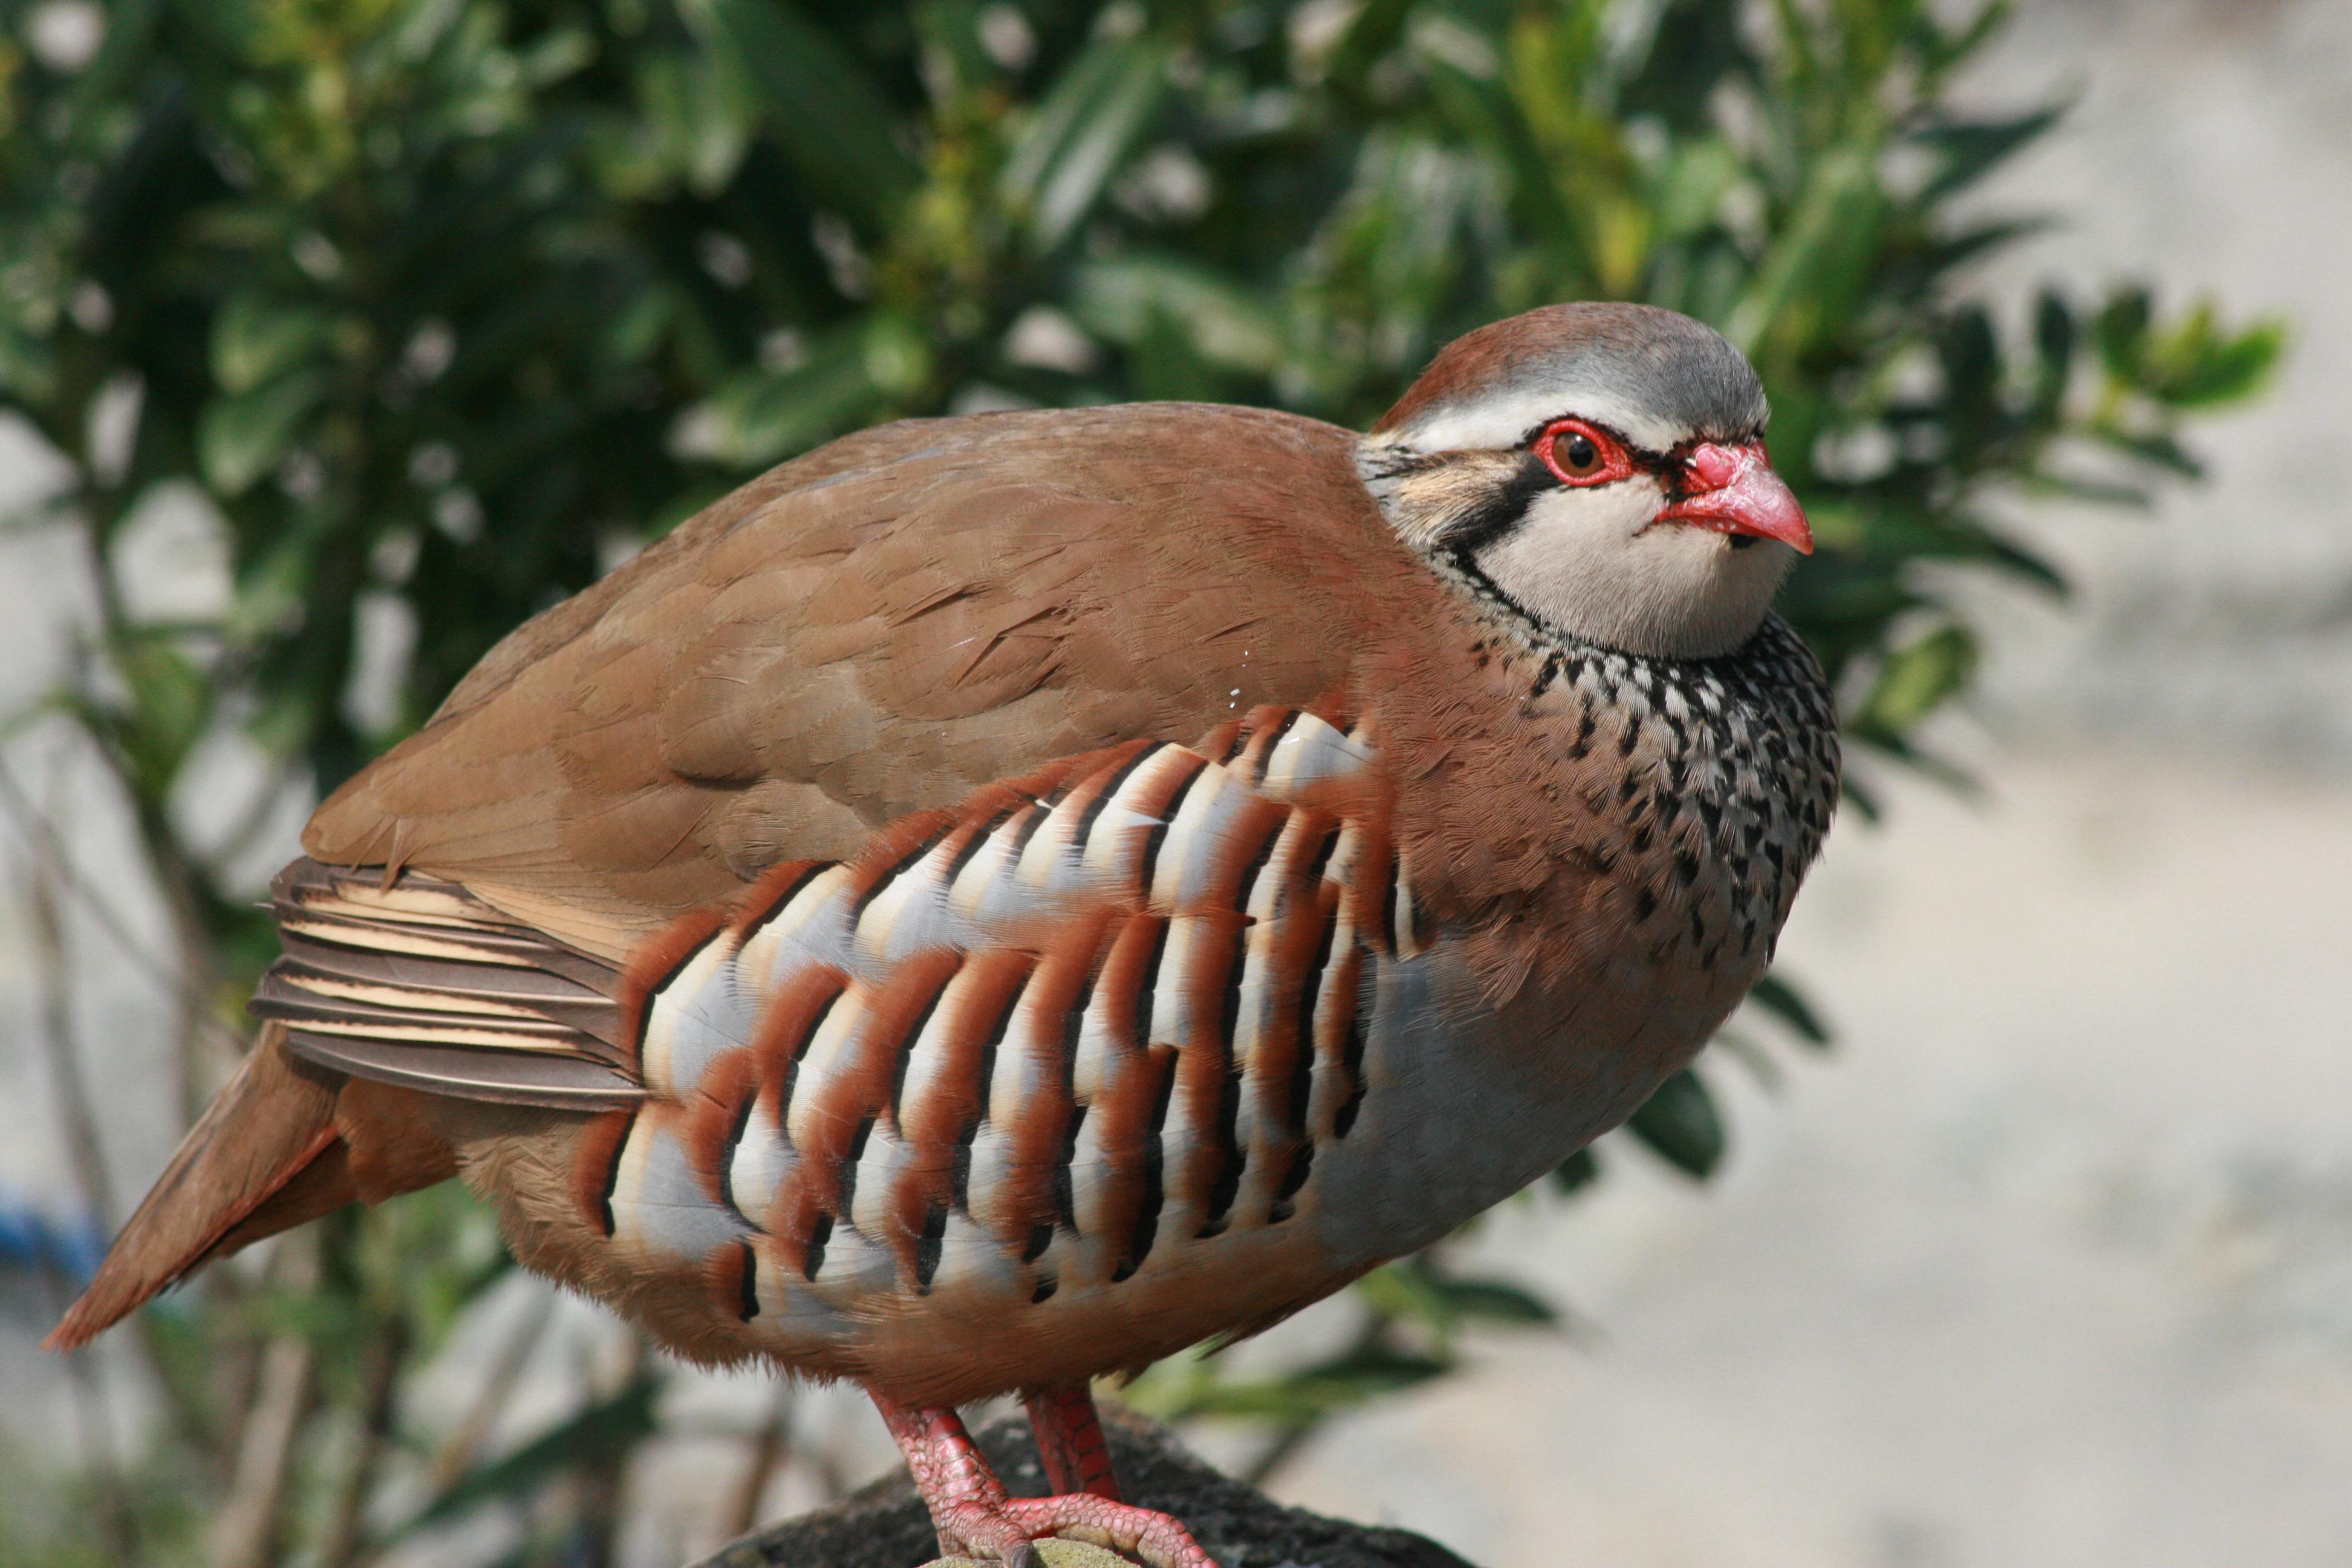 Red-legged partridge | New Zealand Birds Online